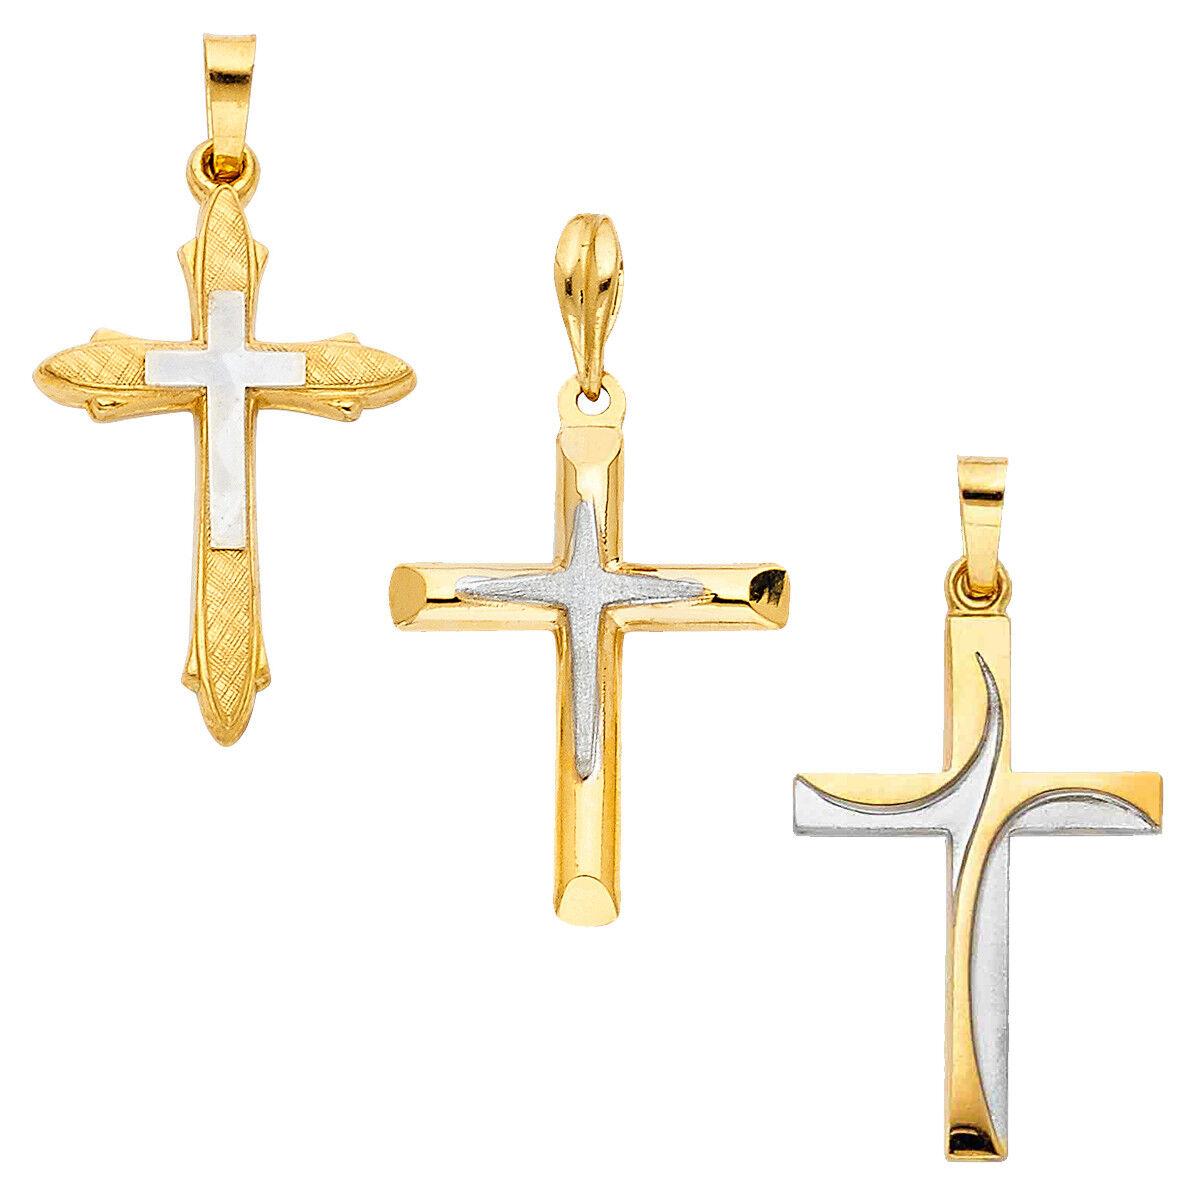 14K Two Tone gold Religious Cross Pendant For Classic Religious Cross Pendant